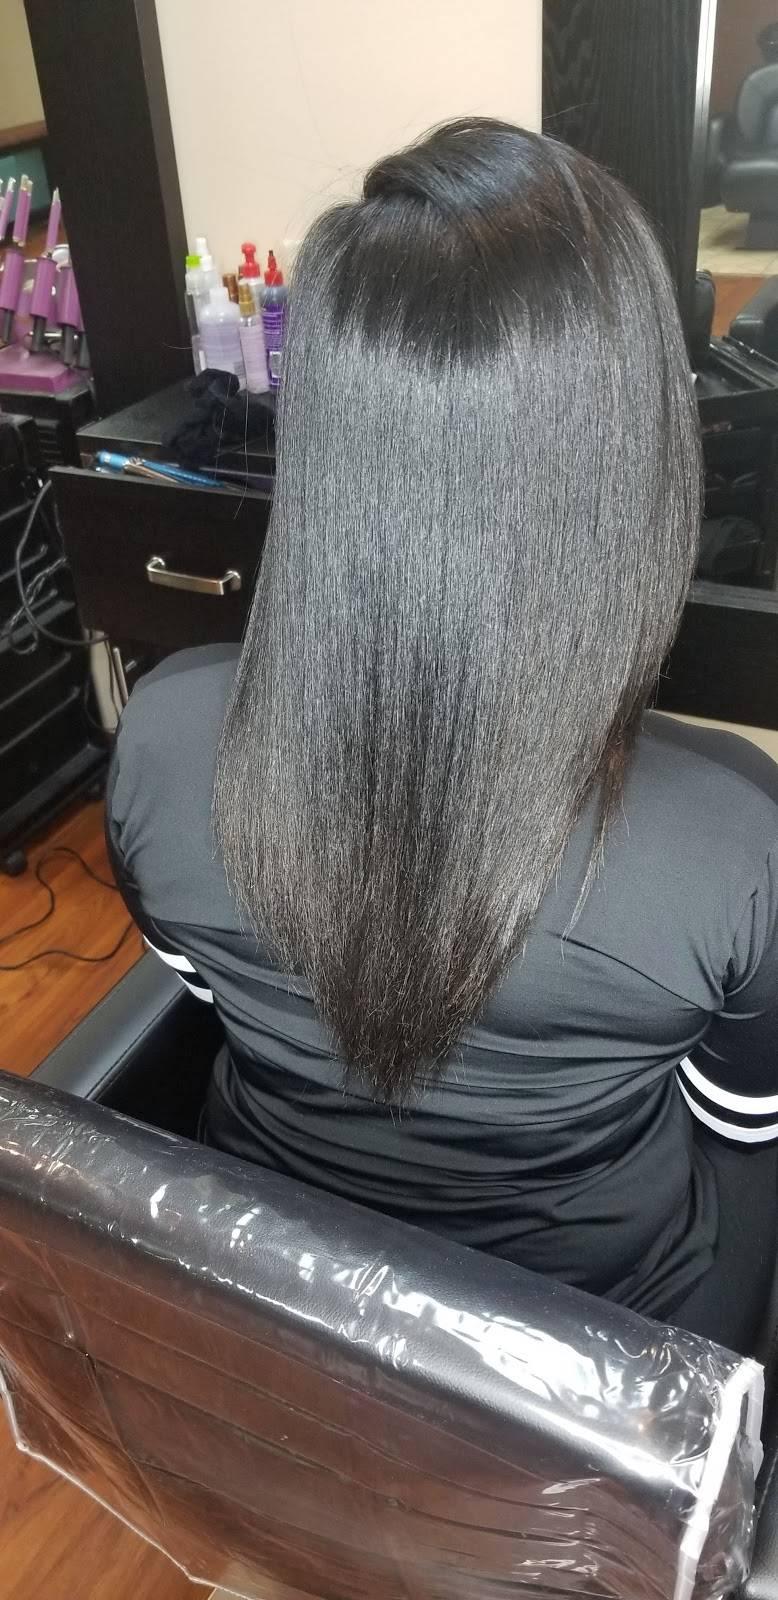 Elite Hair Care USA ( inside My Salon Suites ) - hair care  | Photo 4 of 9 | Address: 2300 E Semoran Blvd, Apopka, FL 32712, USA | Phone: (407) 499-3882